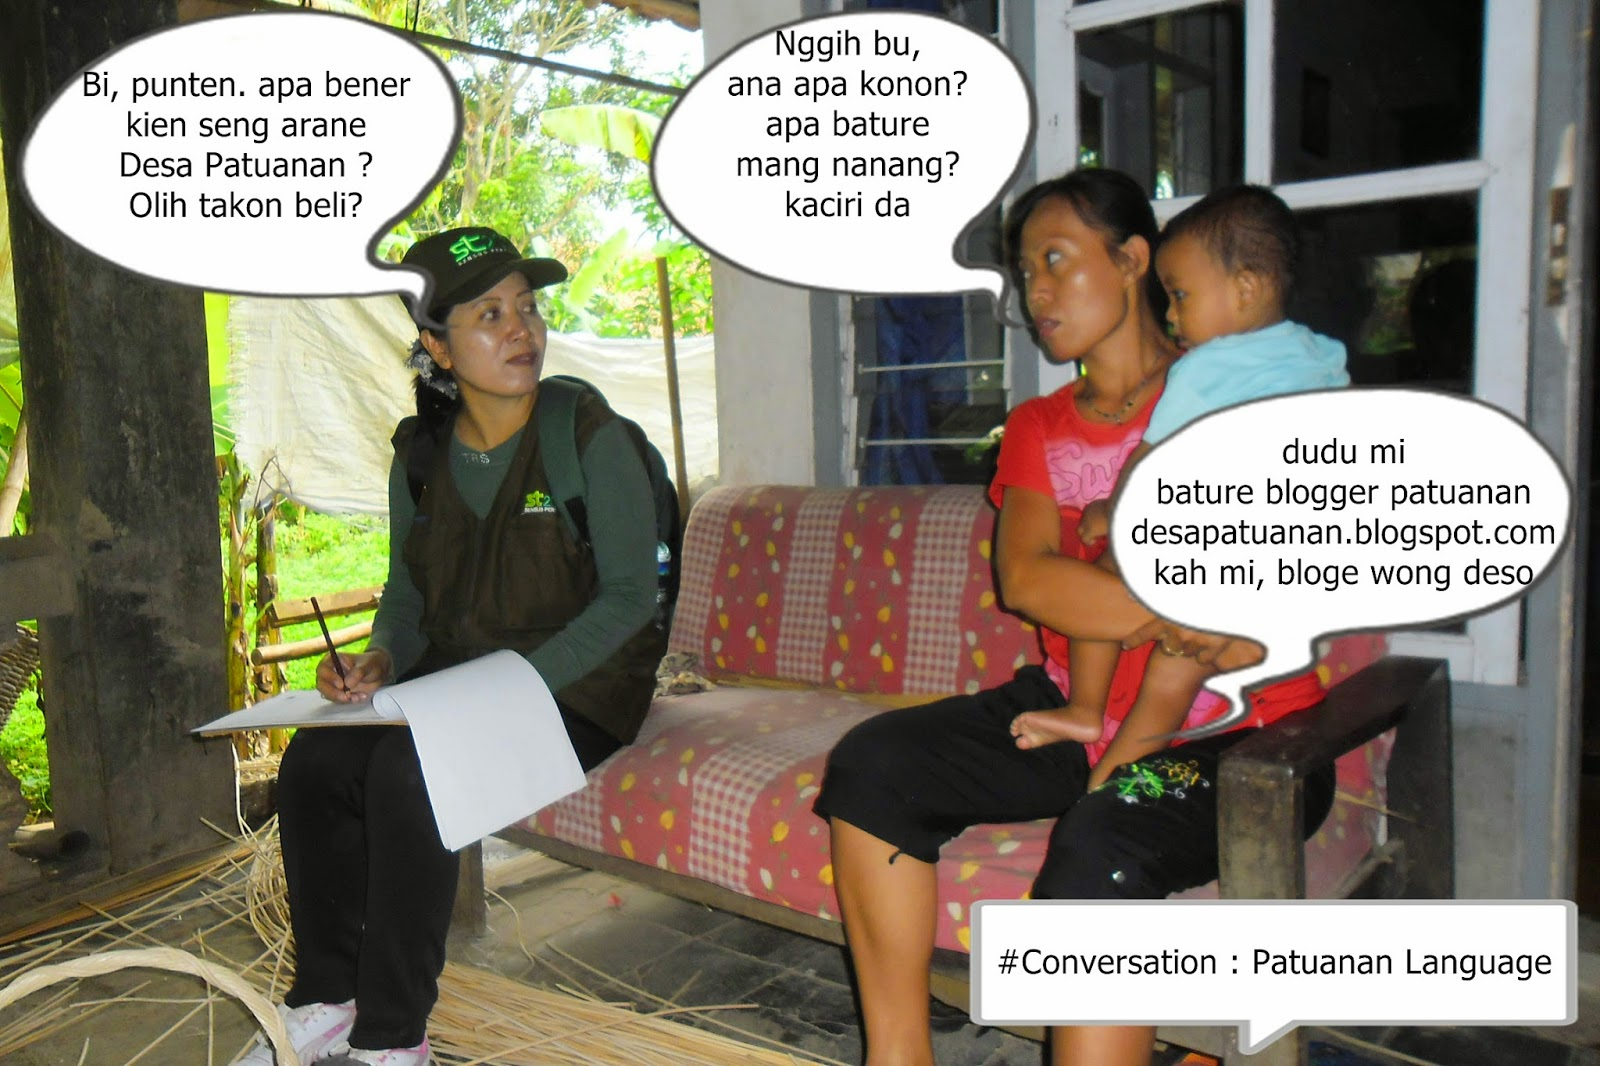 Foto Lucu Buat Komen Bahasa Jawa Terbaru Display Picture Unik